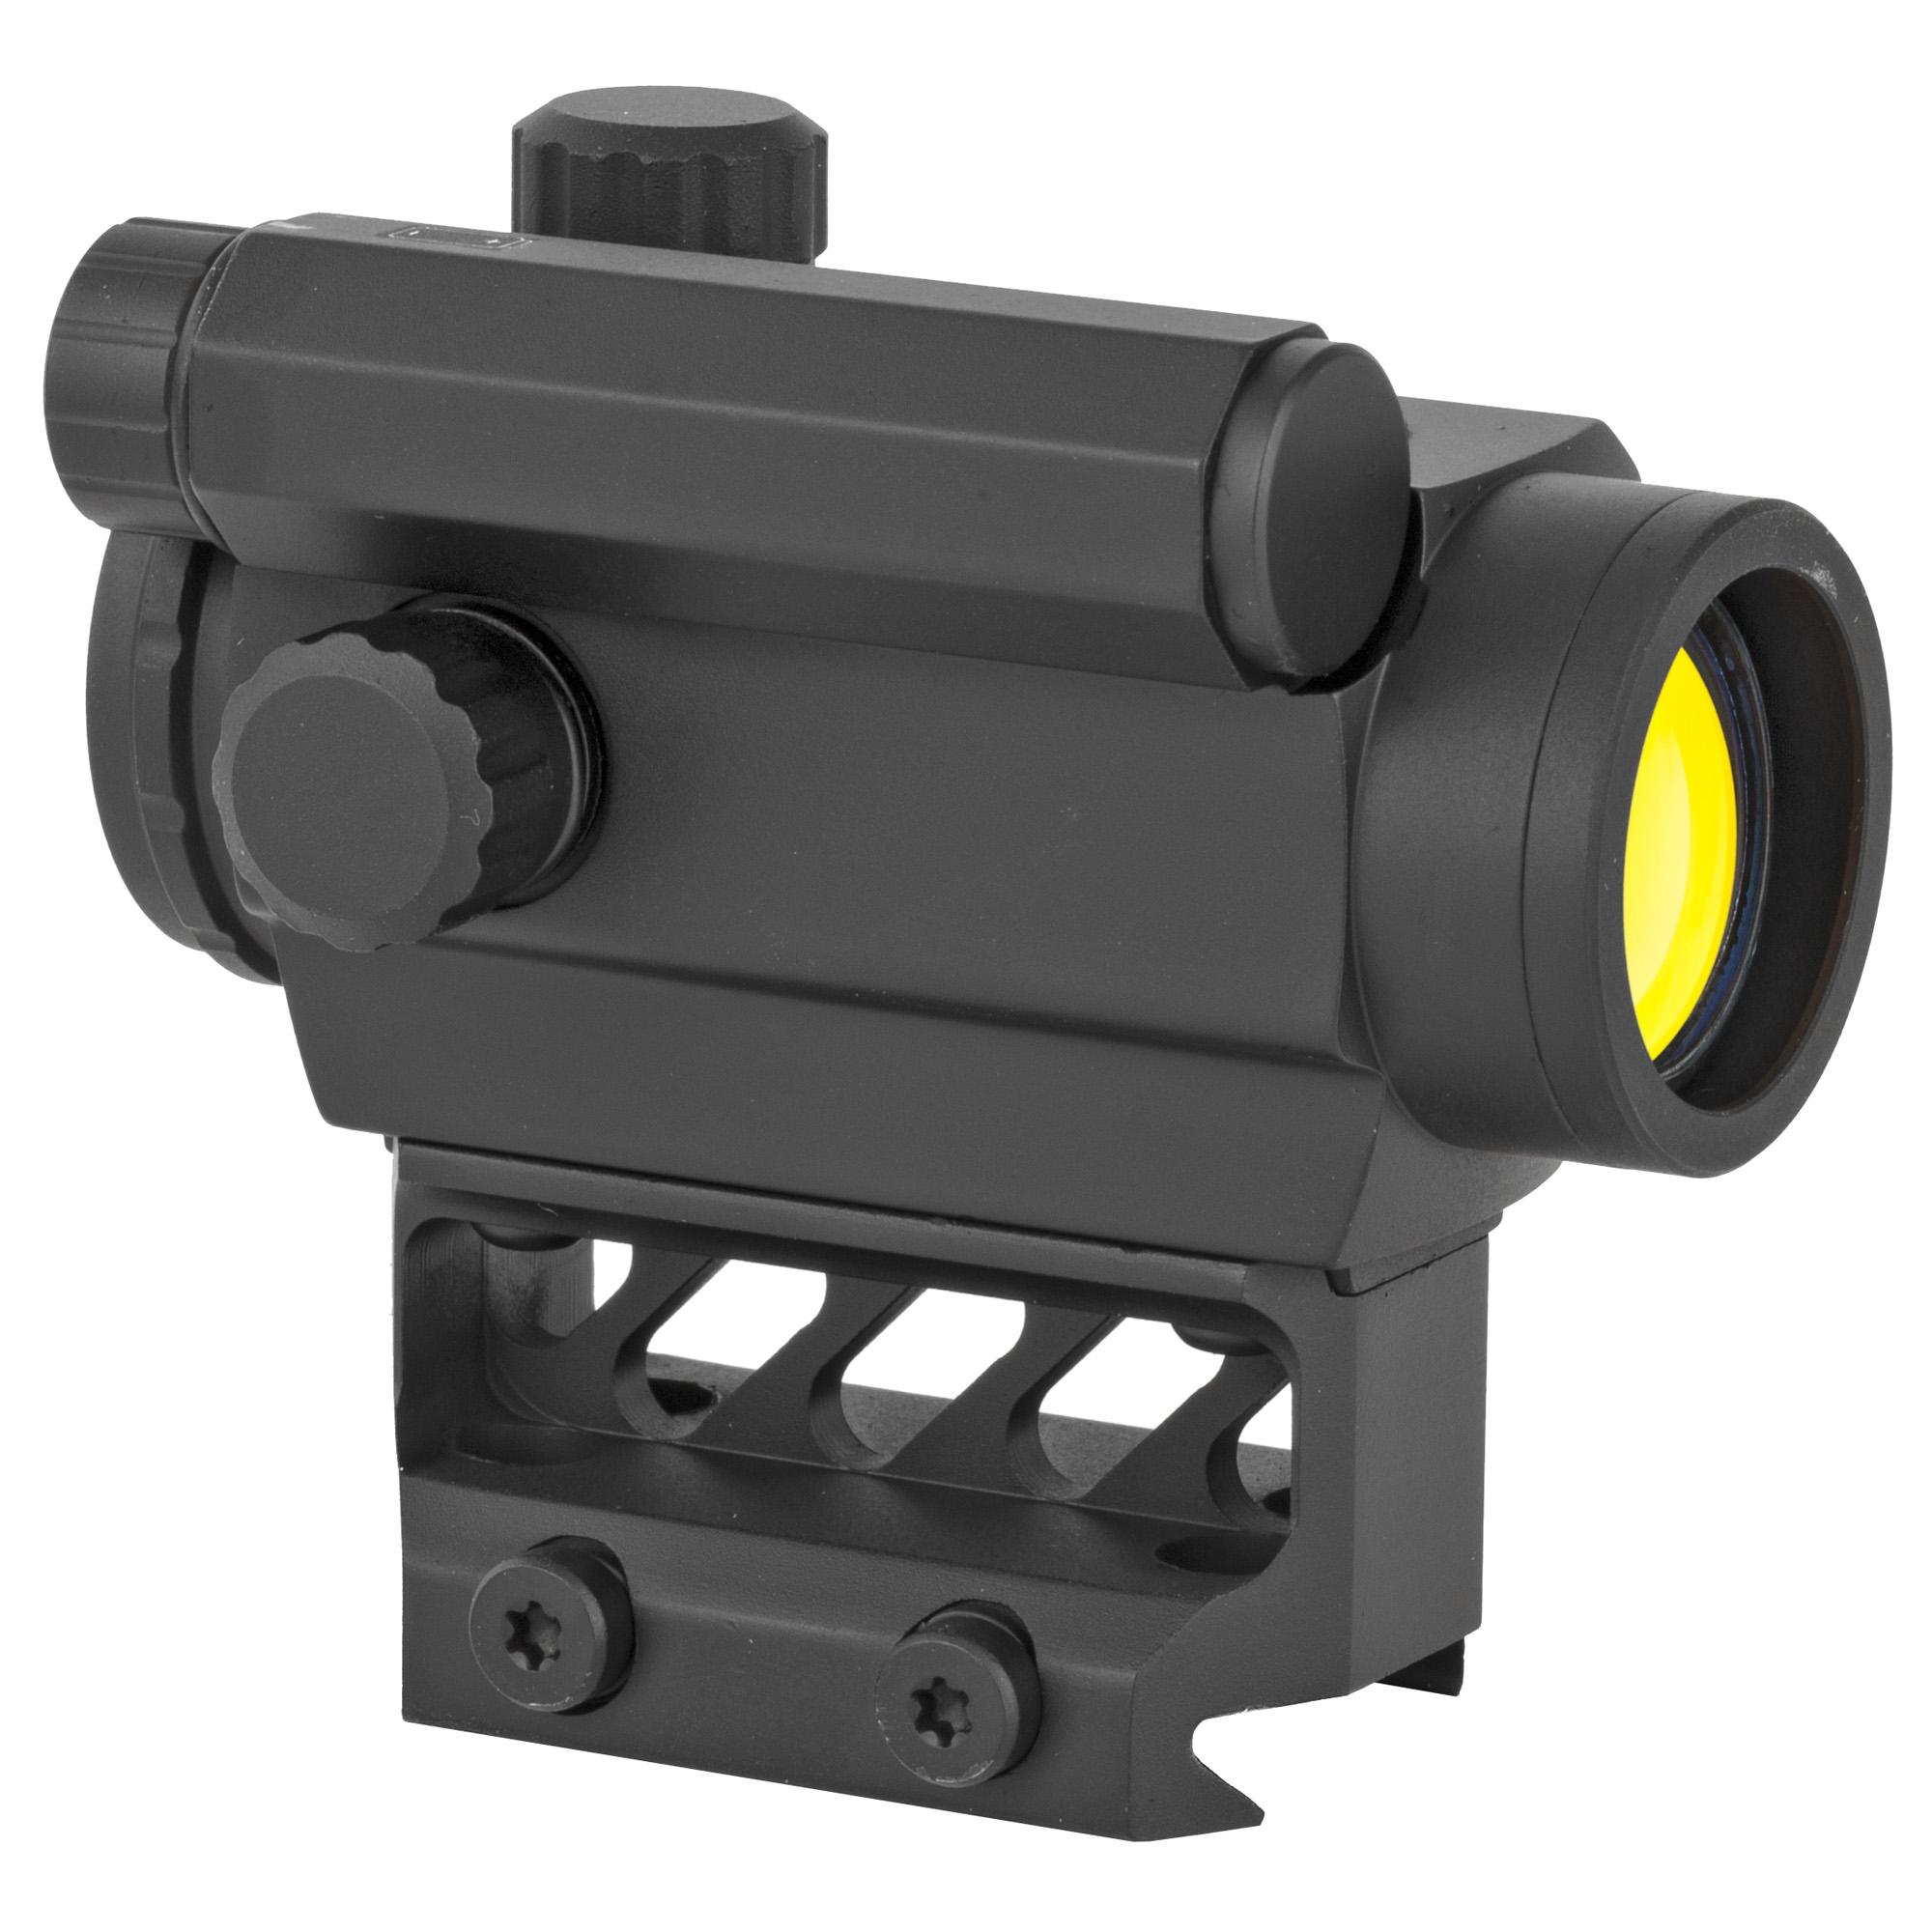 Black Spider Optics M0129 Micro Red Dot - MSR Arms 1